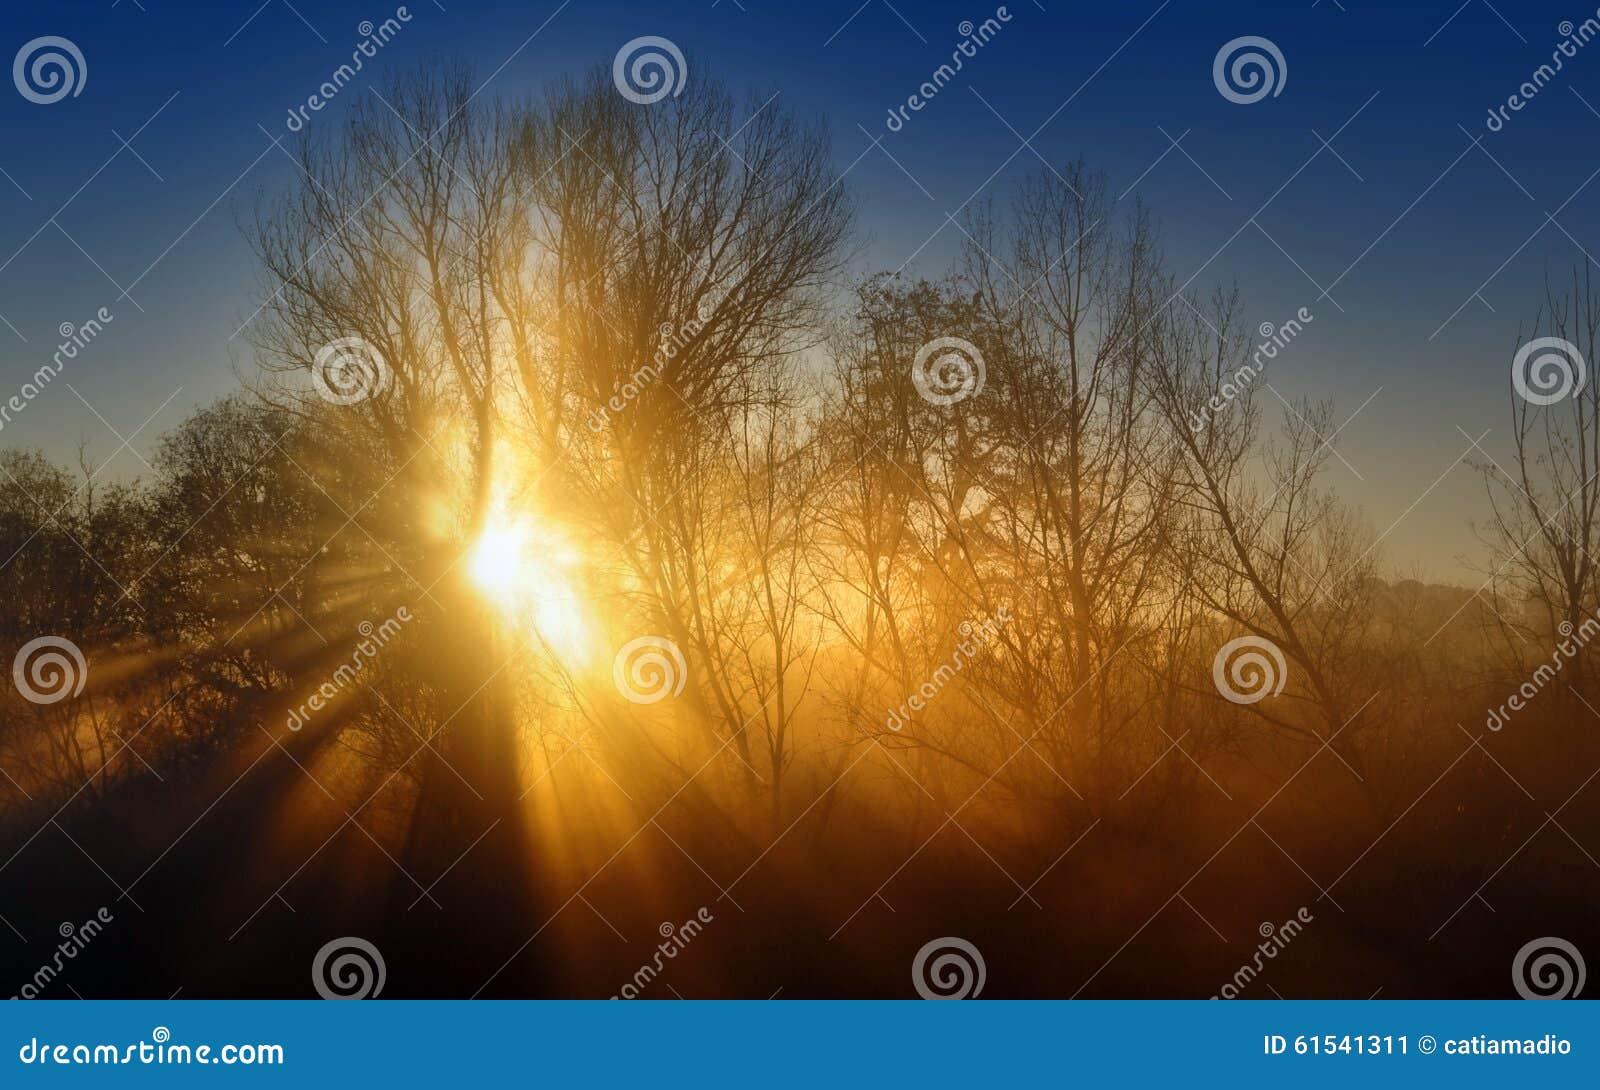 Beams of soft light